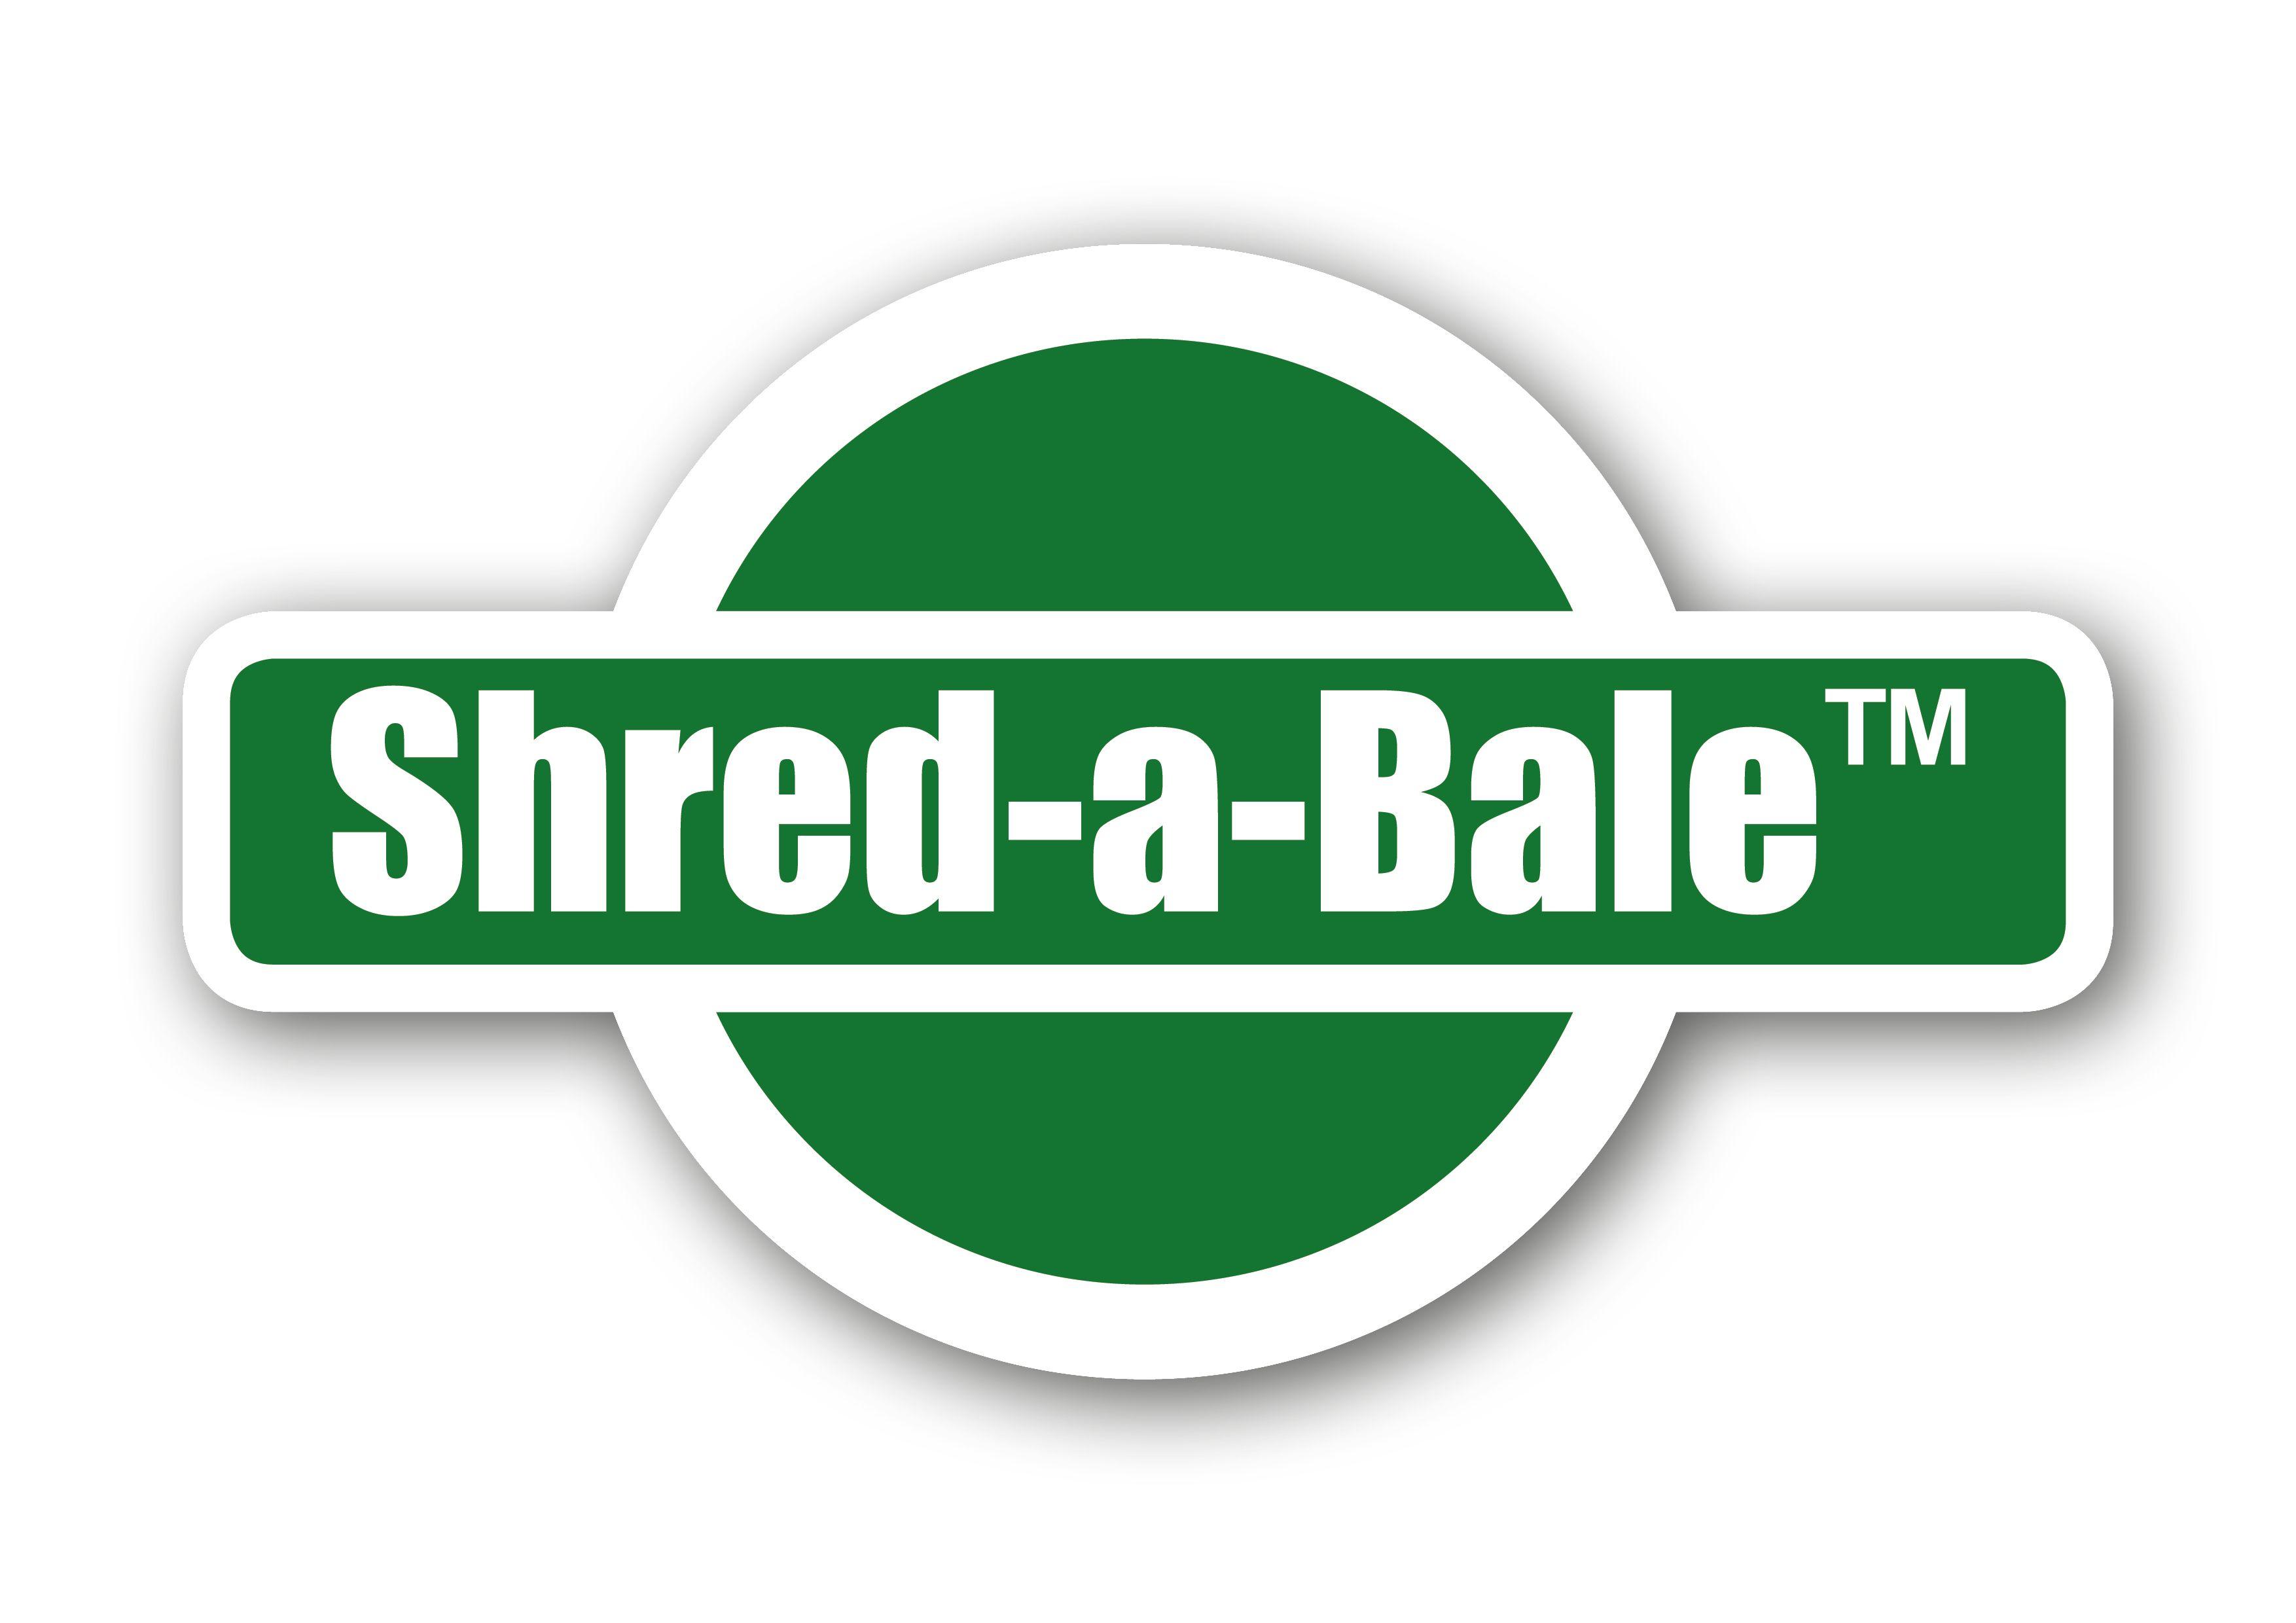 Spread-a-Bale Ltd